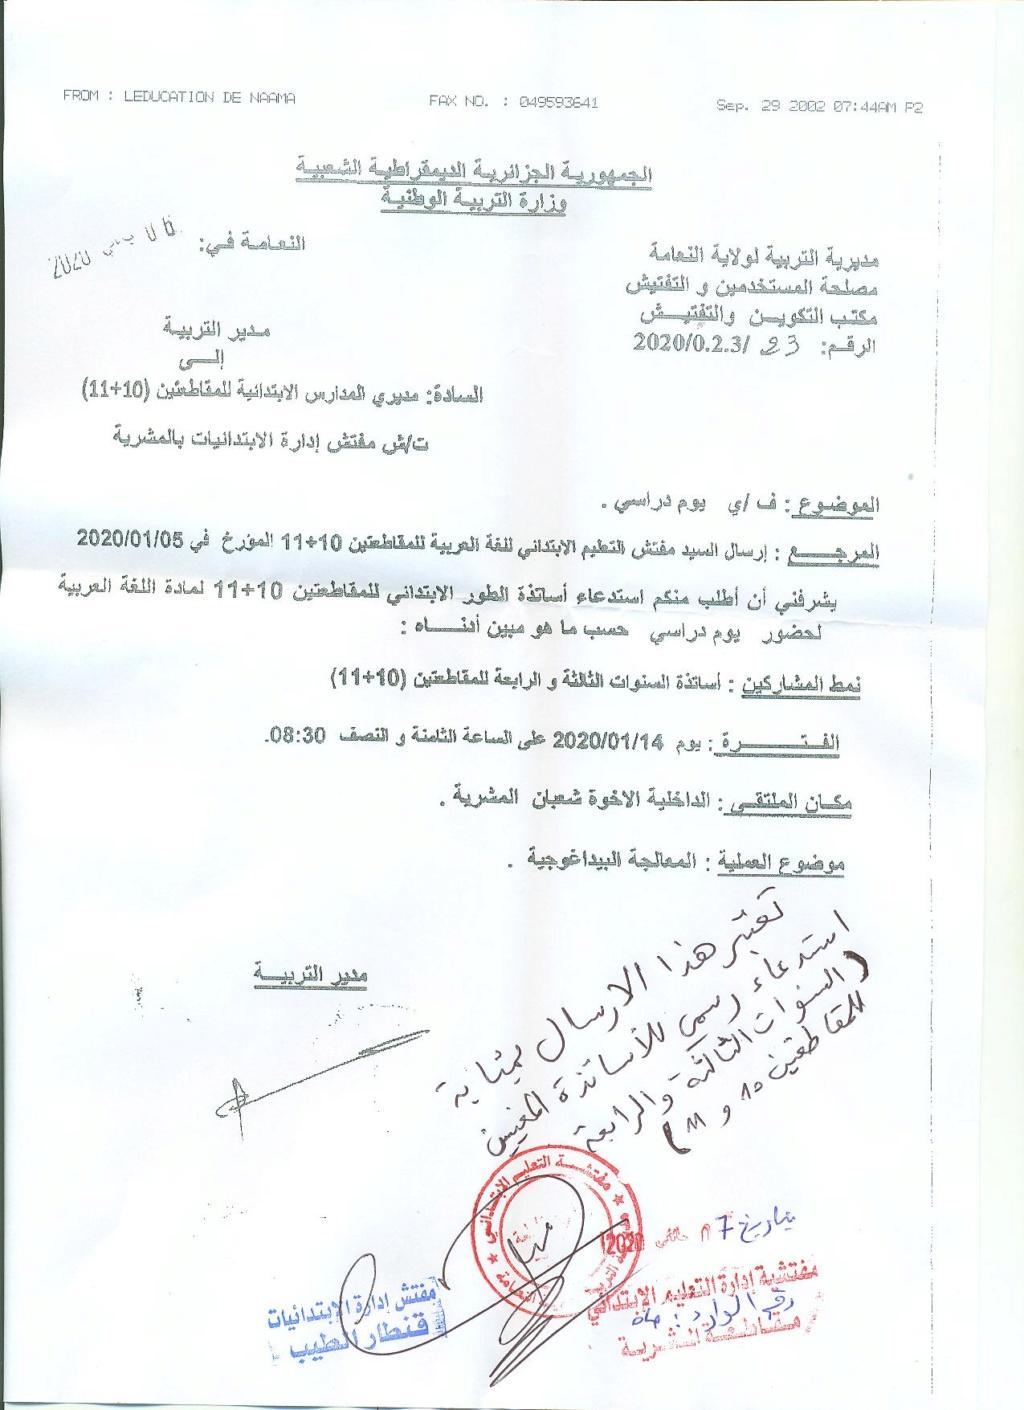 تكويـــــــــــــــــــــن المقاطعة 10 و 11 Oaioa_13